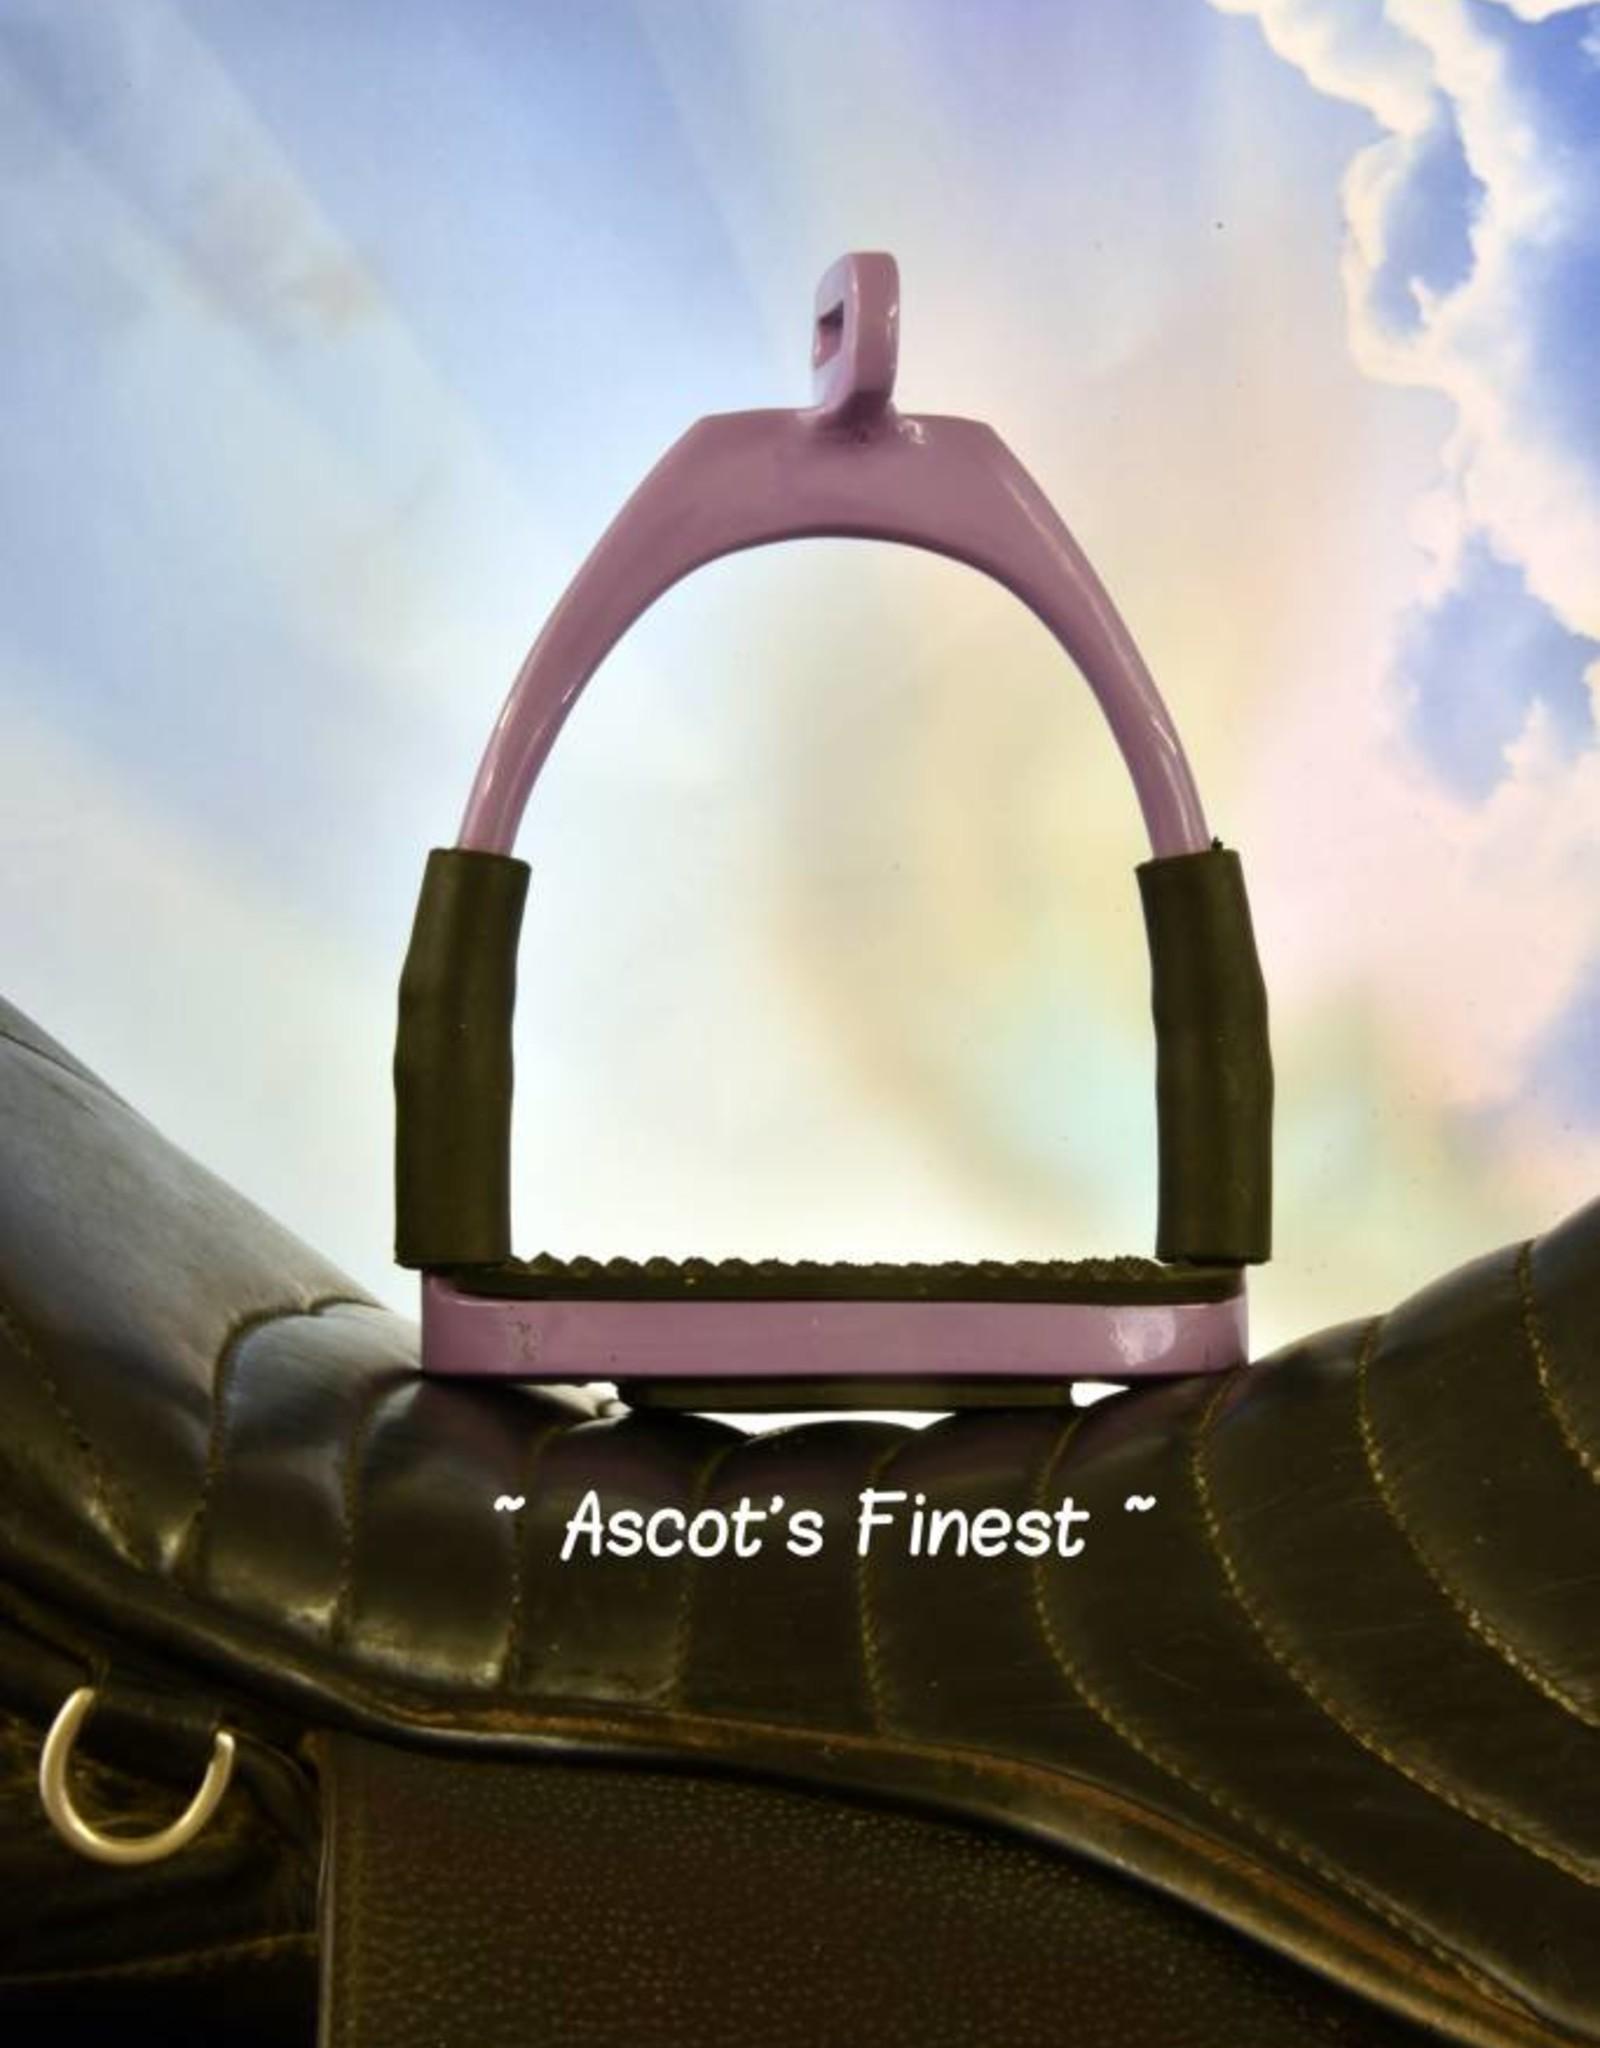 Ascot's Finest Lichtpaarse veiligheids stijgbeugels